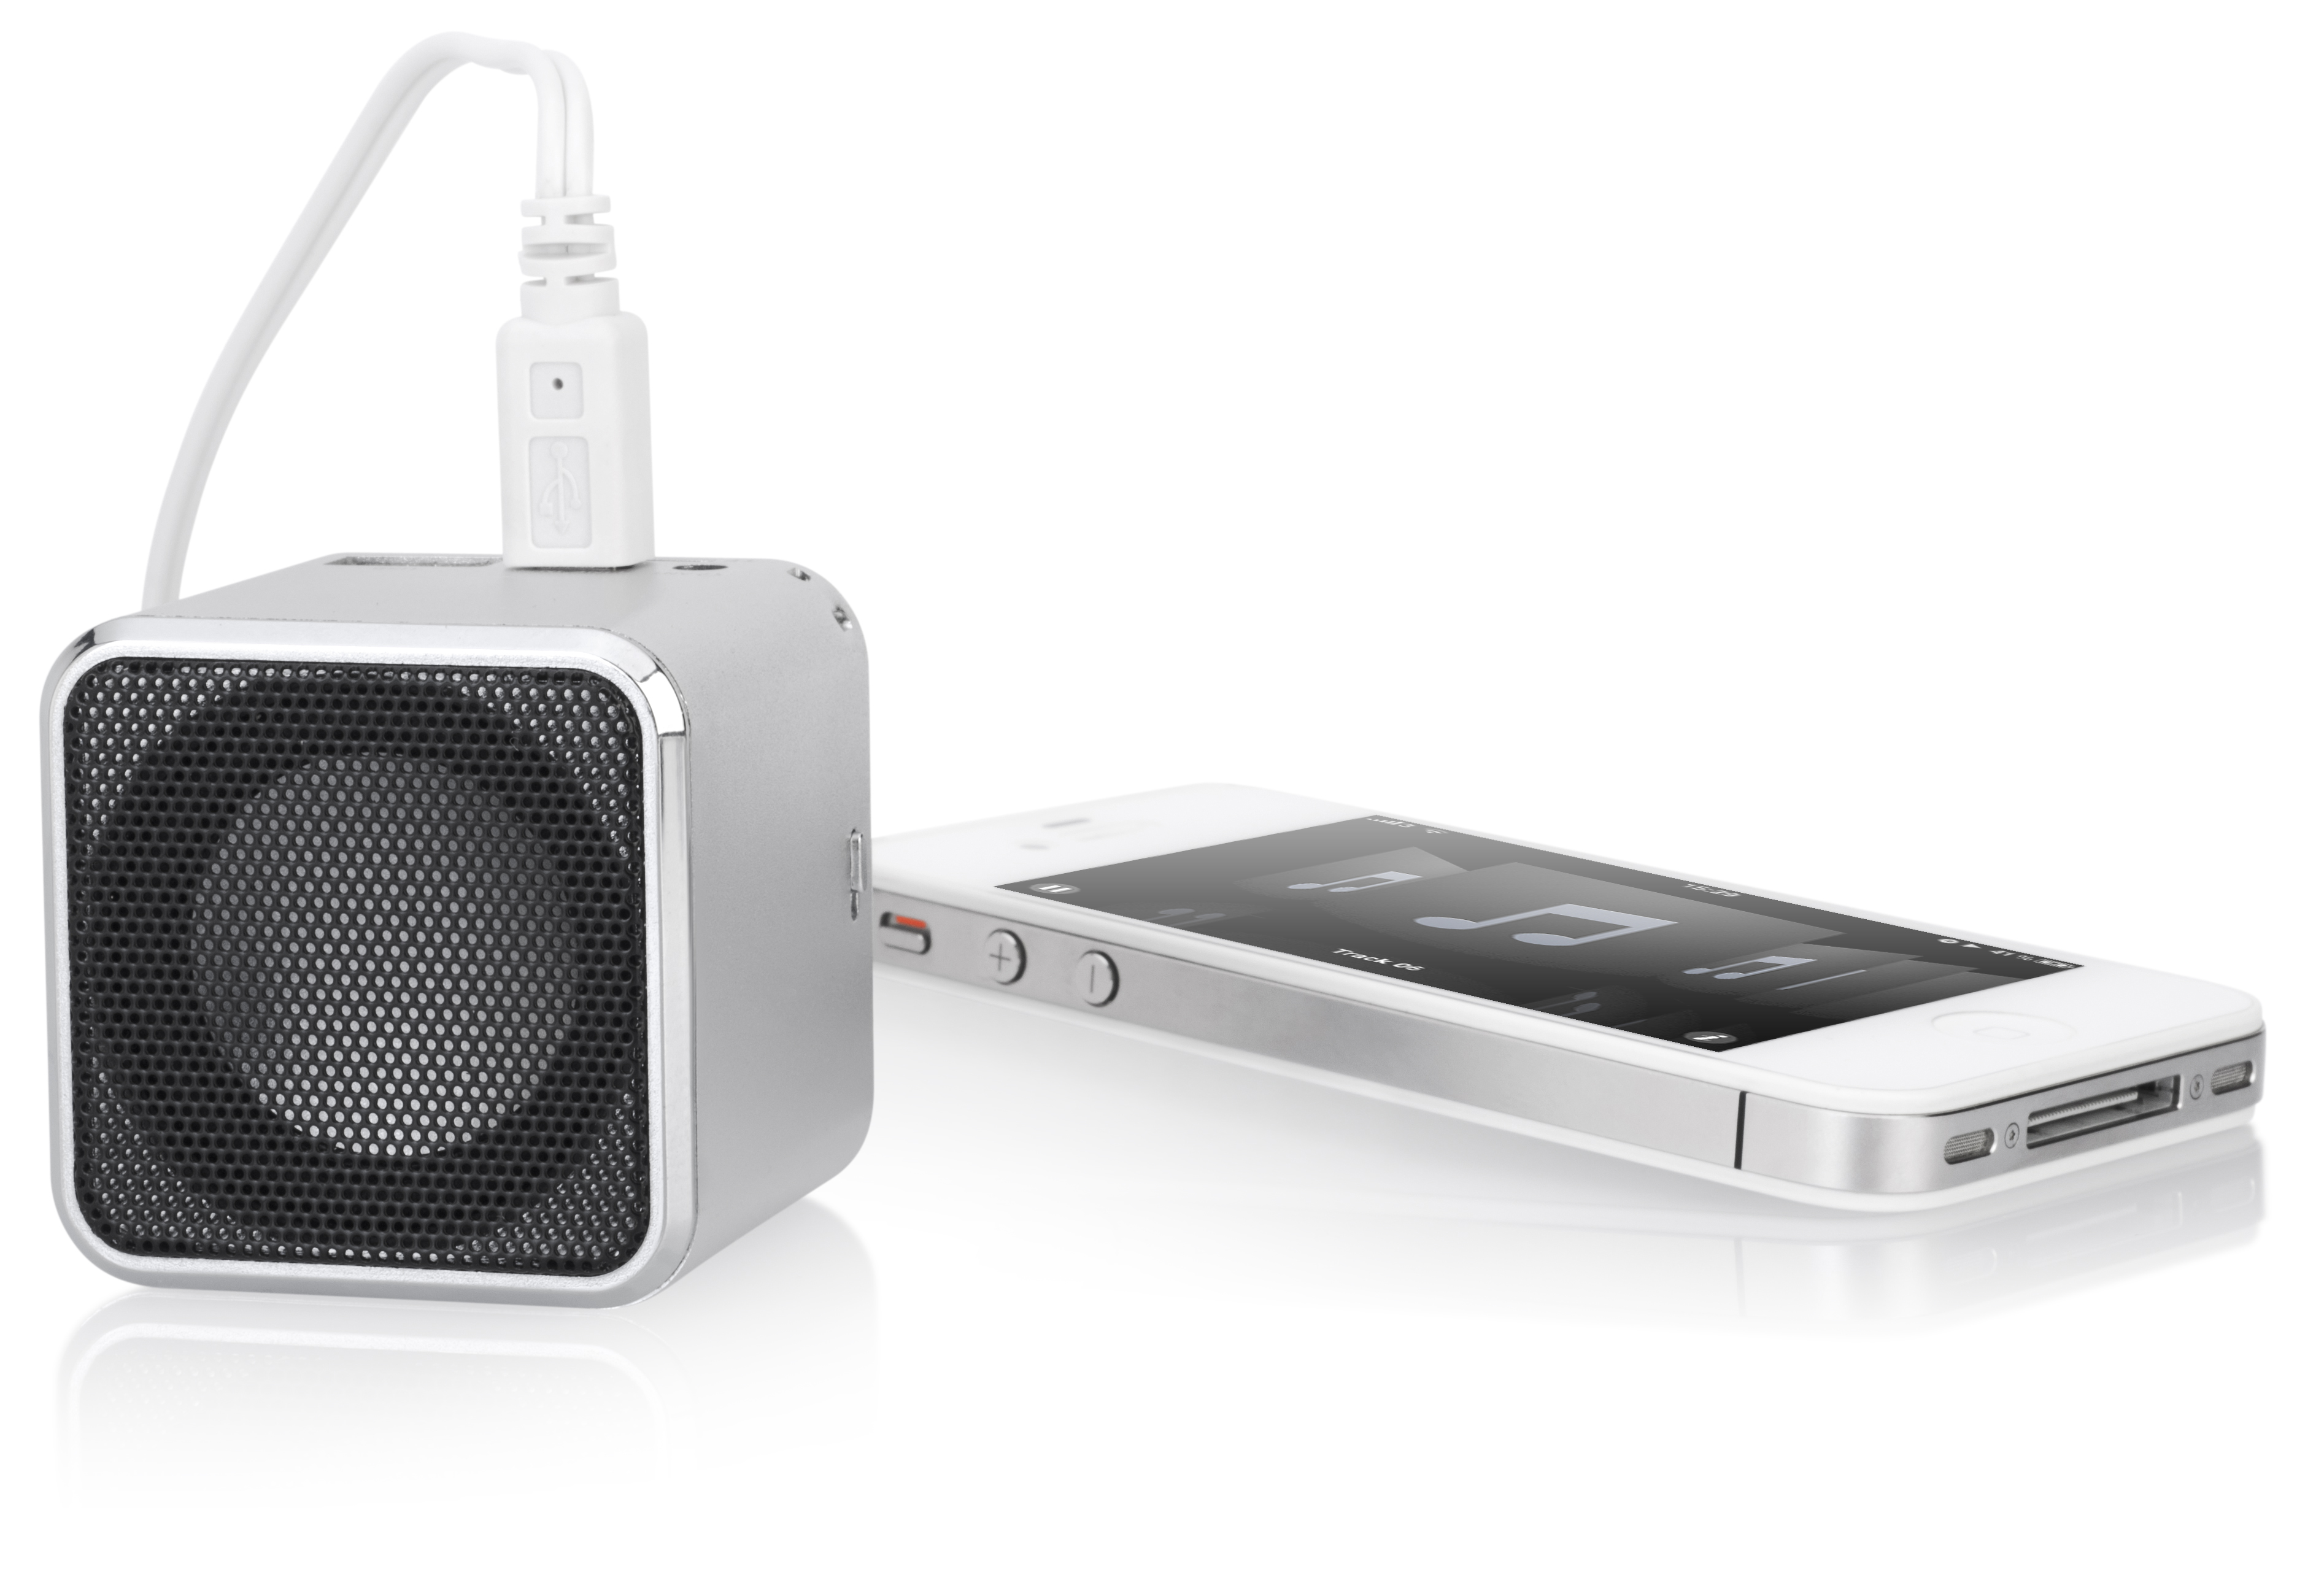 The Cube Clock Radio Portable Speaker Express Impressions Inc